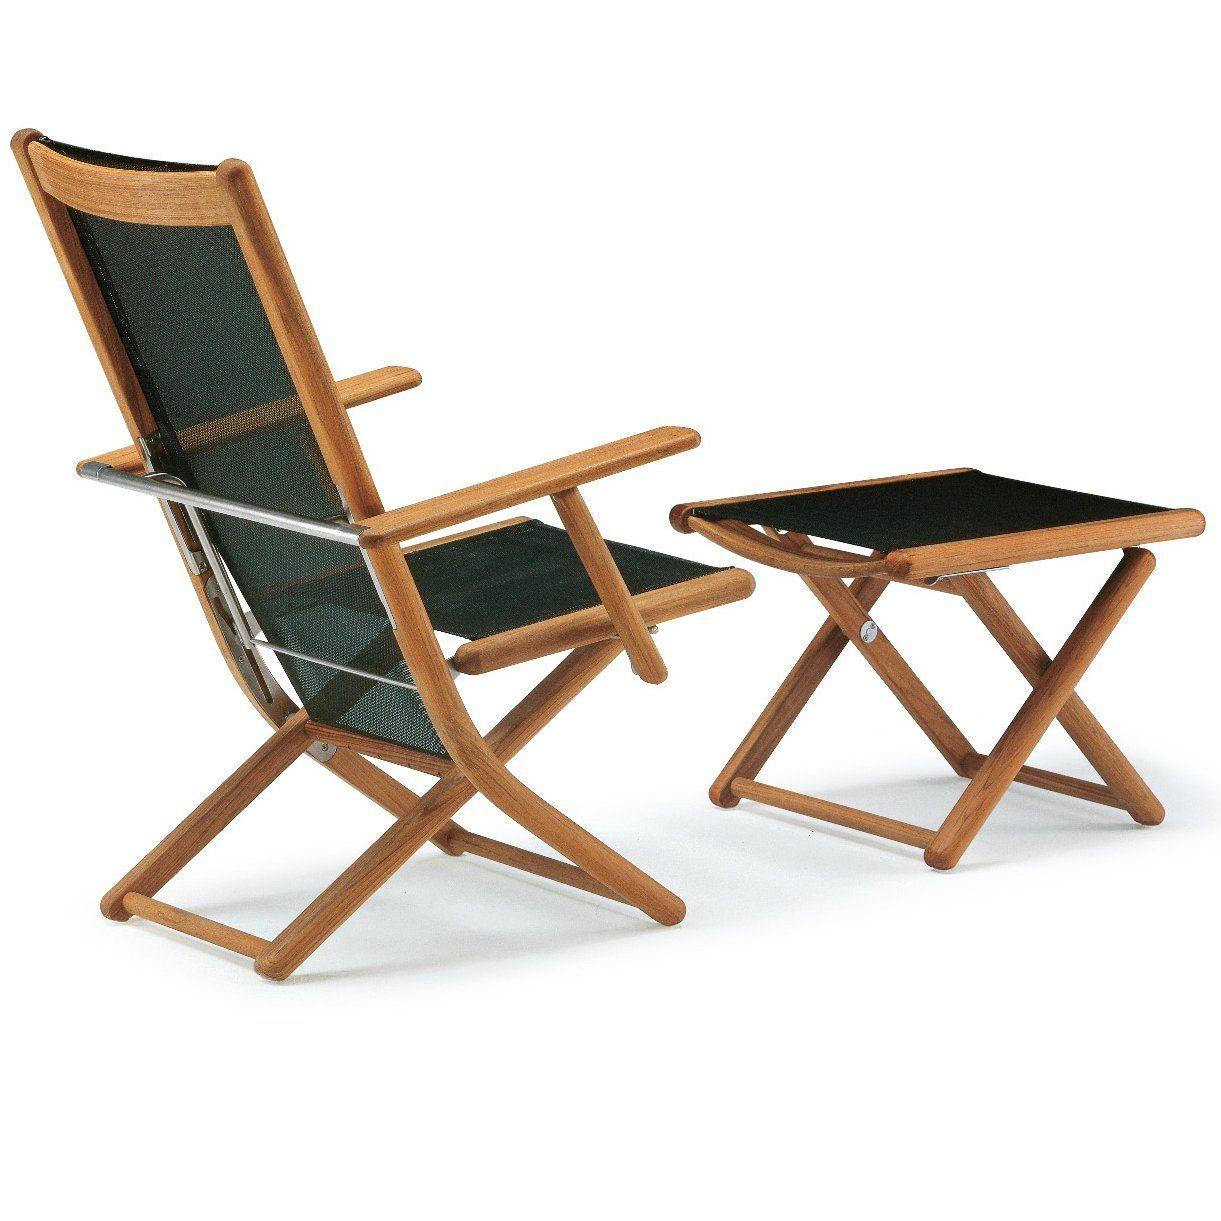 fischer m bel tennis verstellsessel. Black Bedroom Furniture Sets. Home Design Ideas